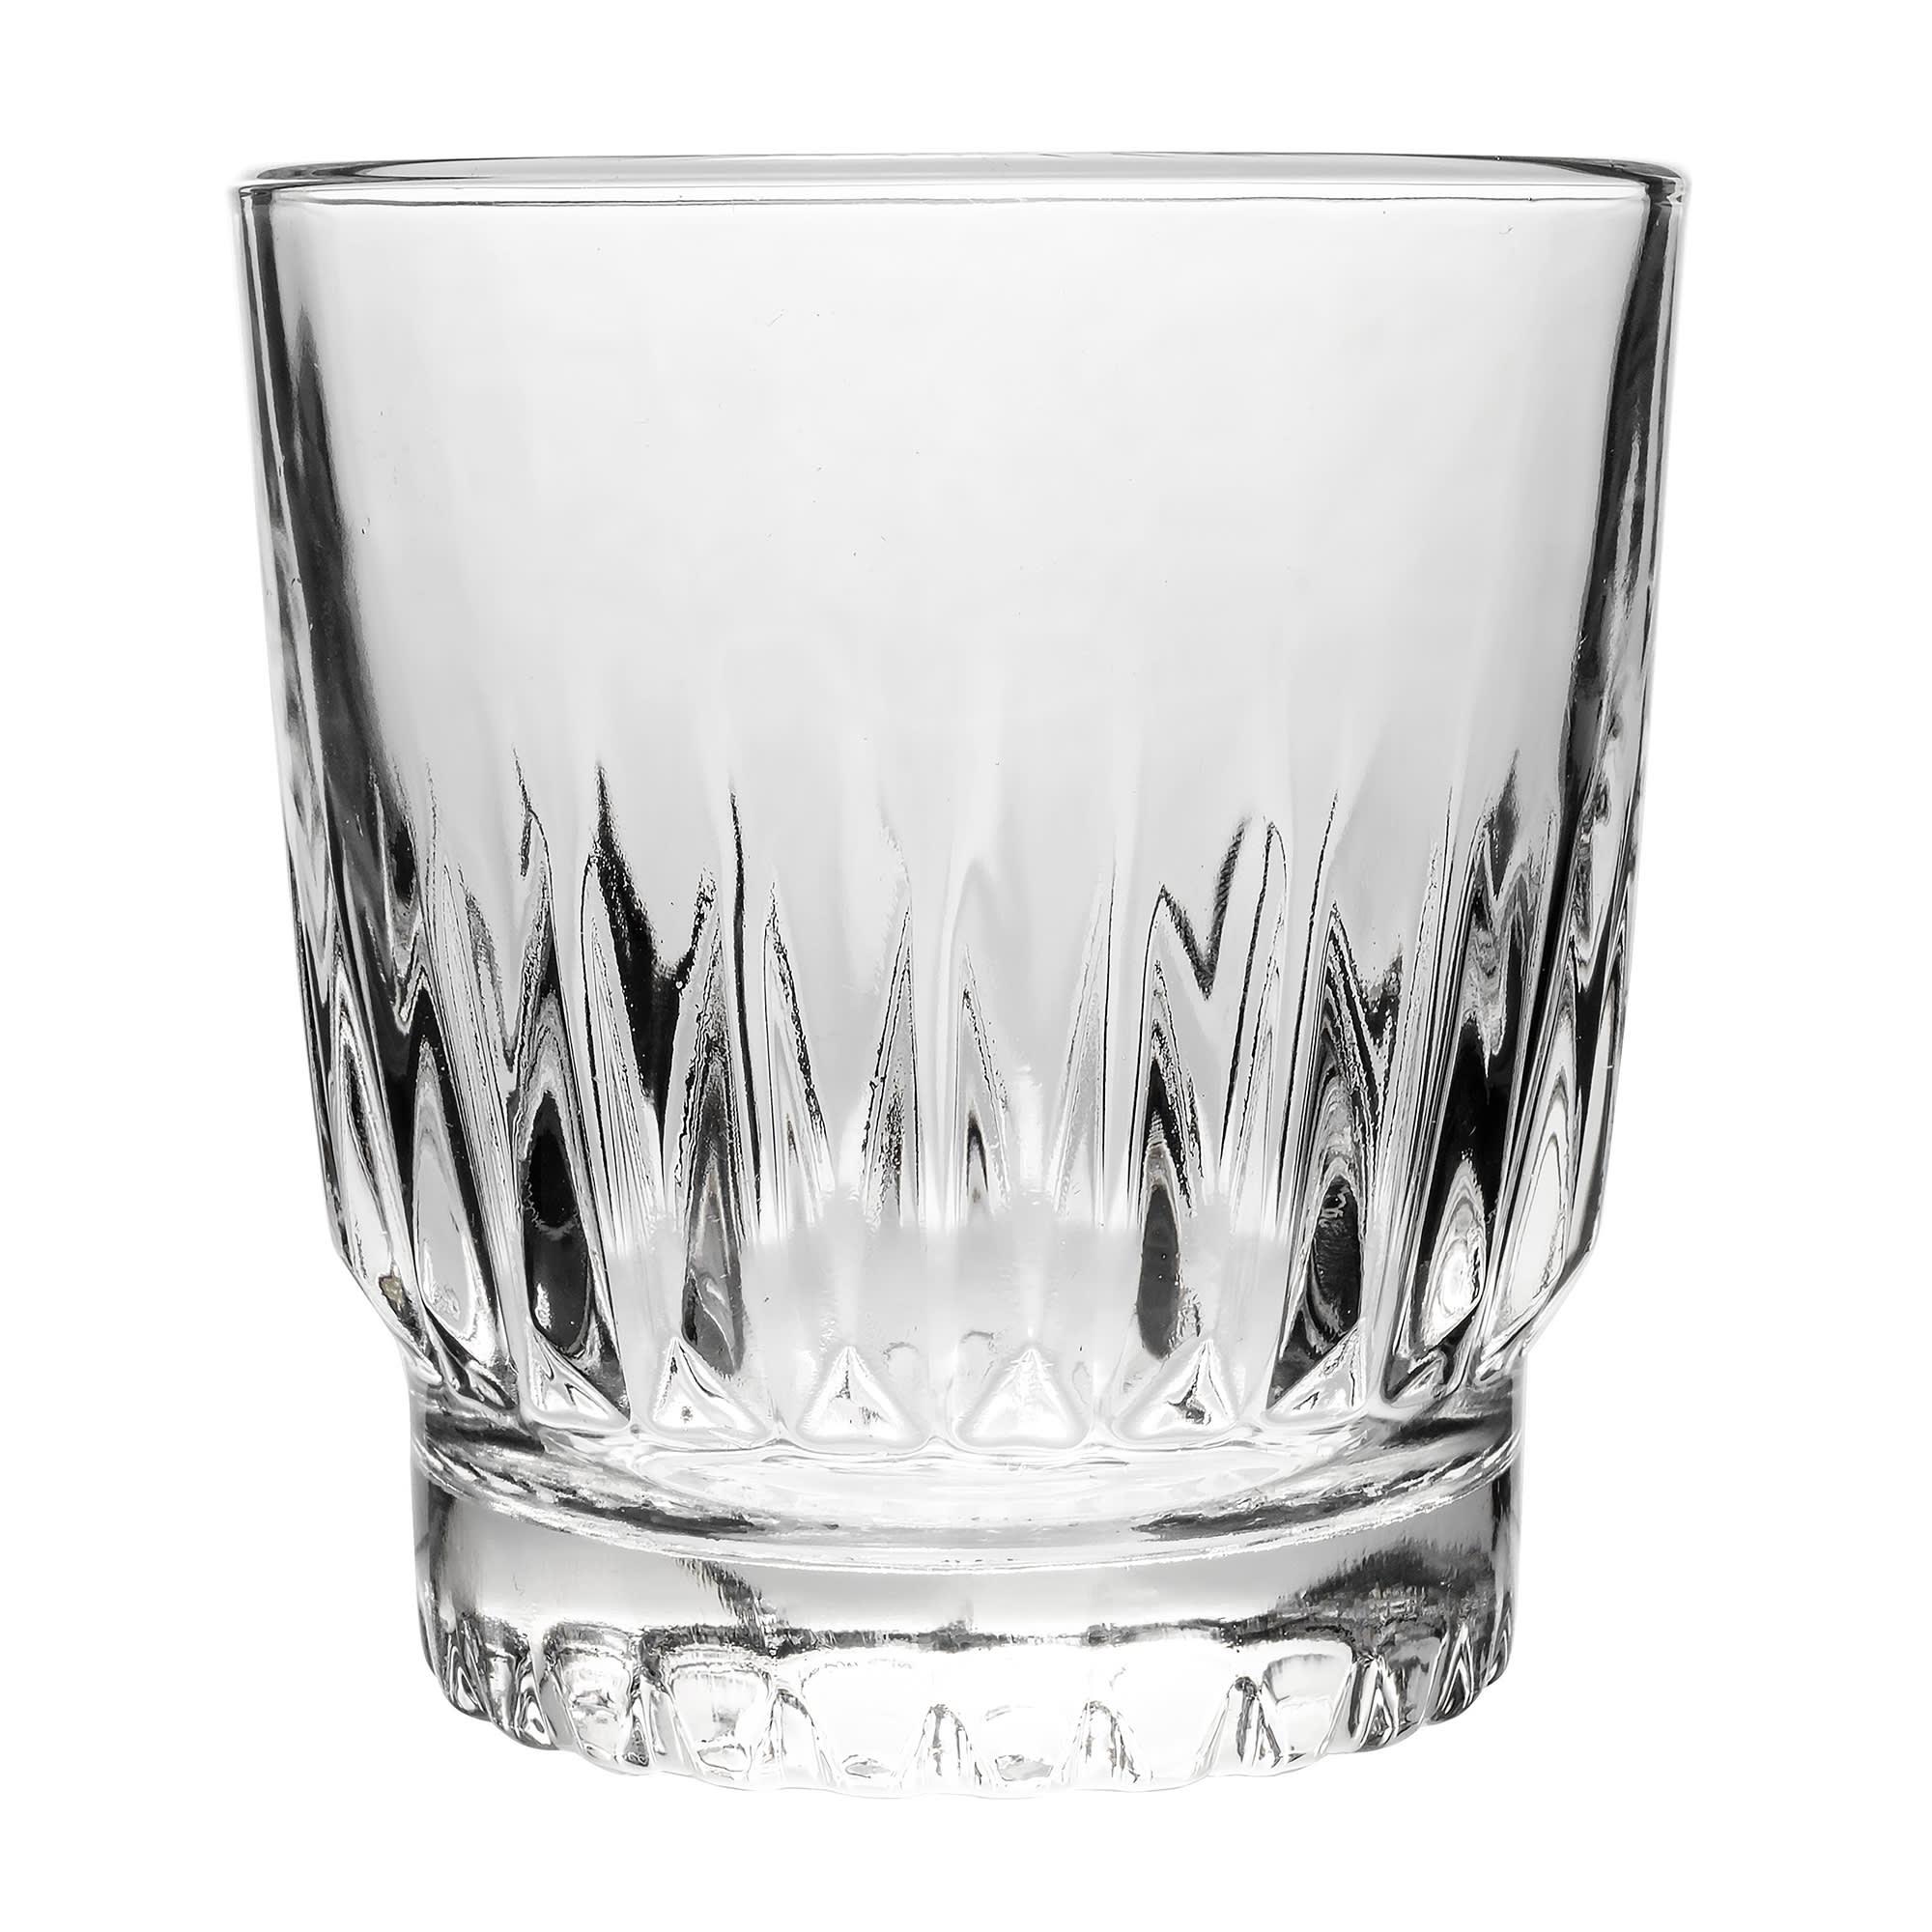 Libbey 15454 8-oz Rocks Glass - Winchester